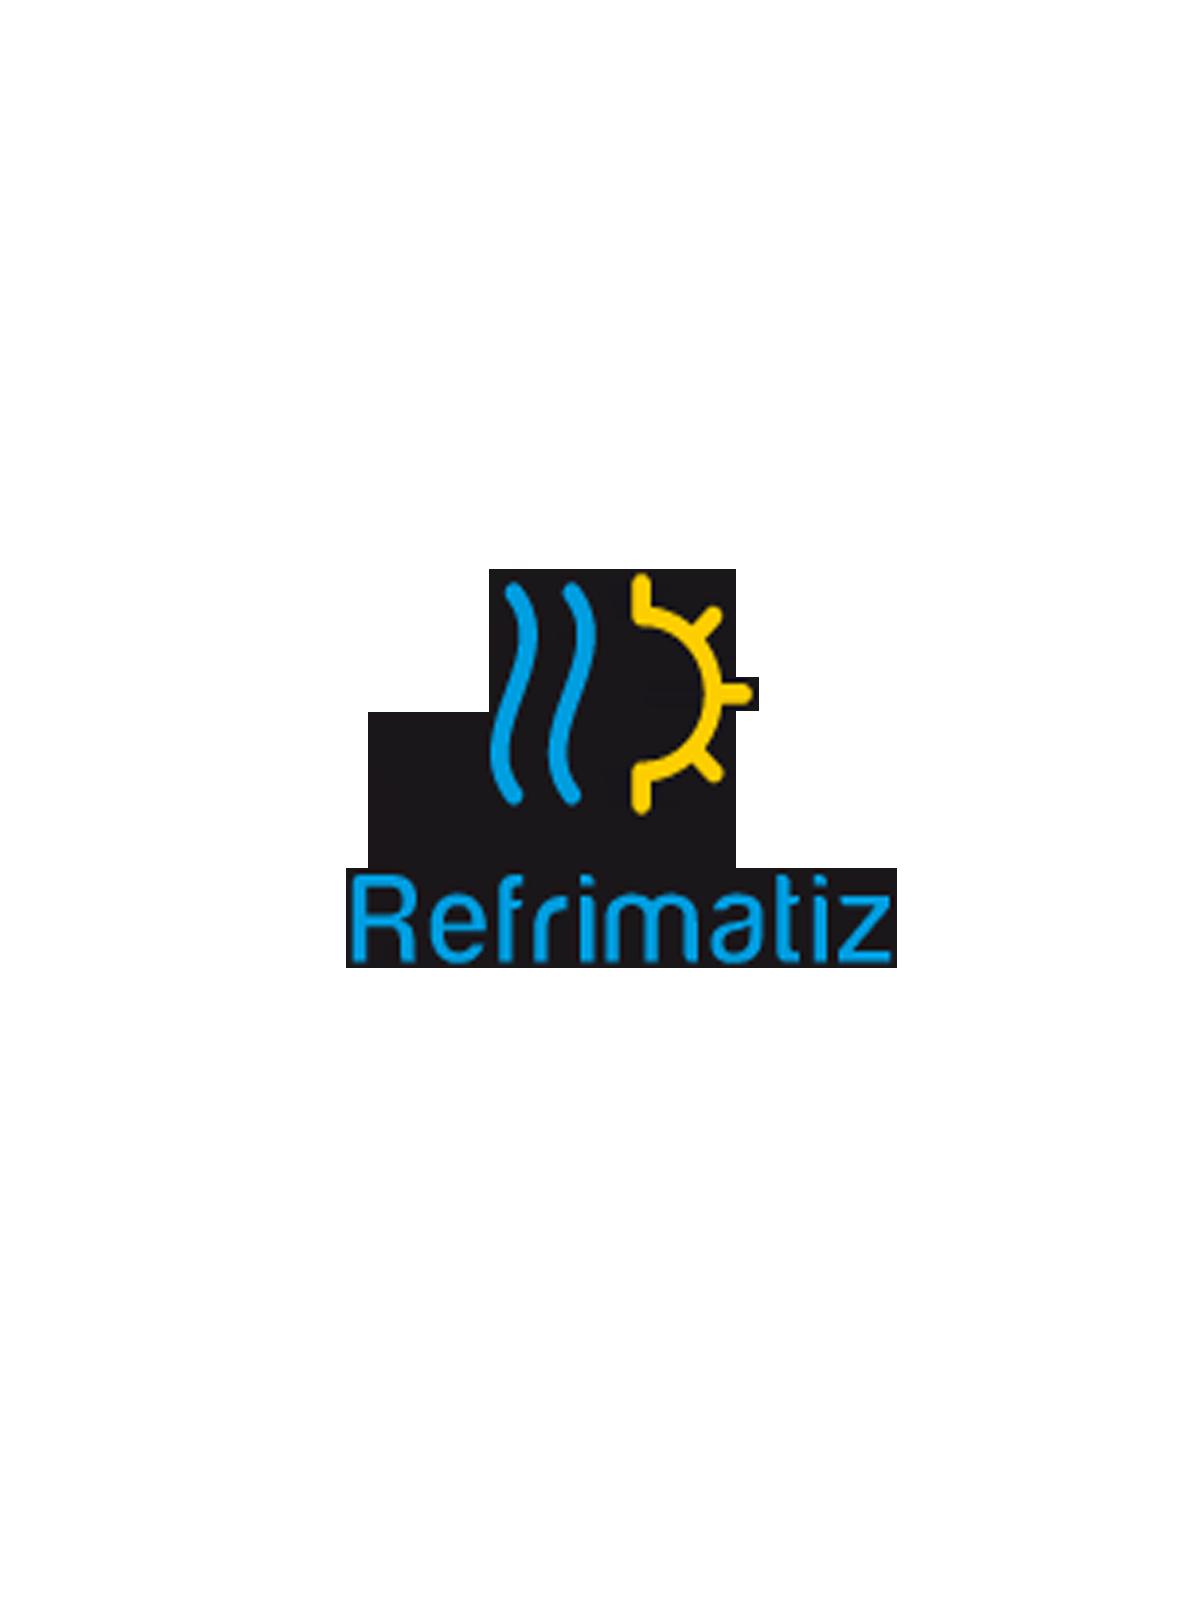 Refrimatiz